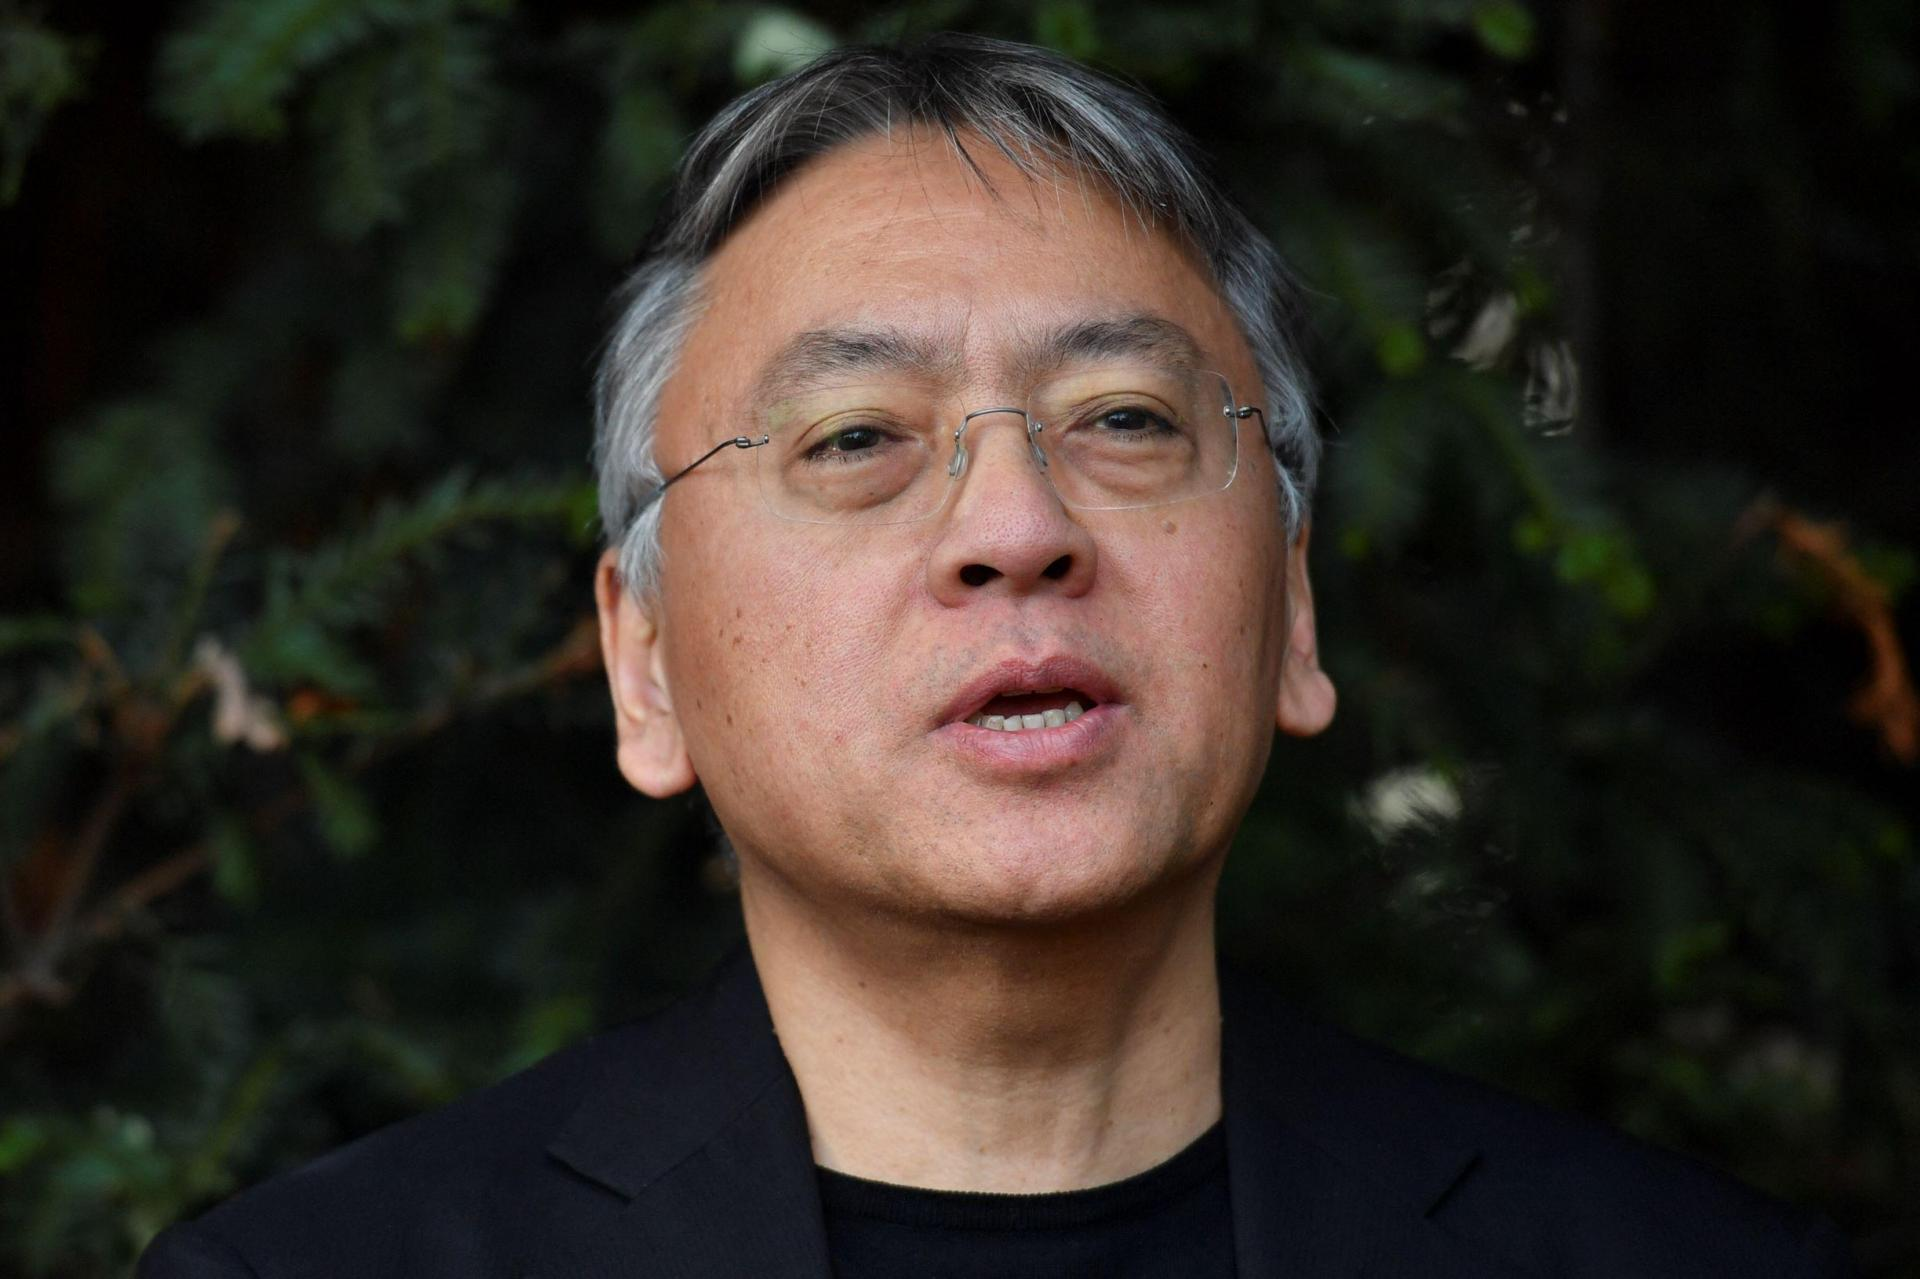 British author Kazuo Ishiguro. Photo: Ben Stansall/AFP